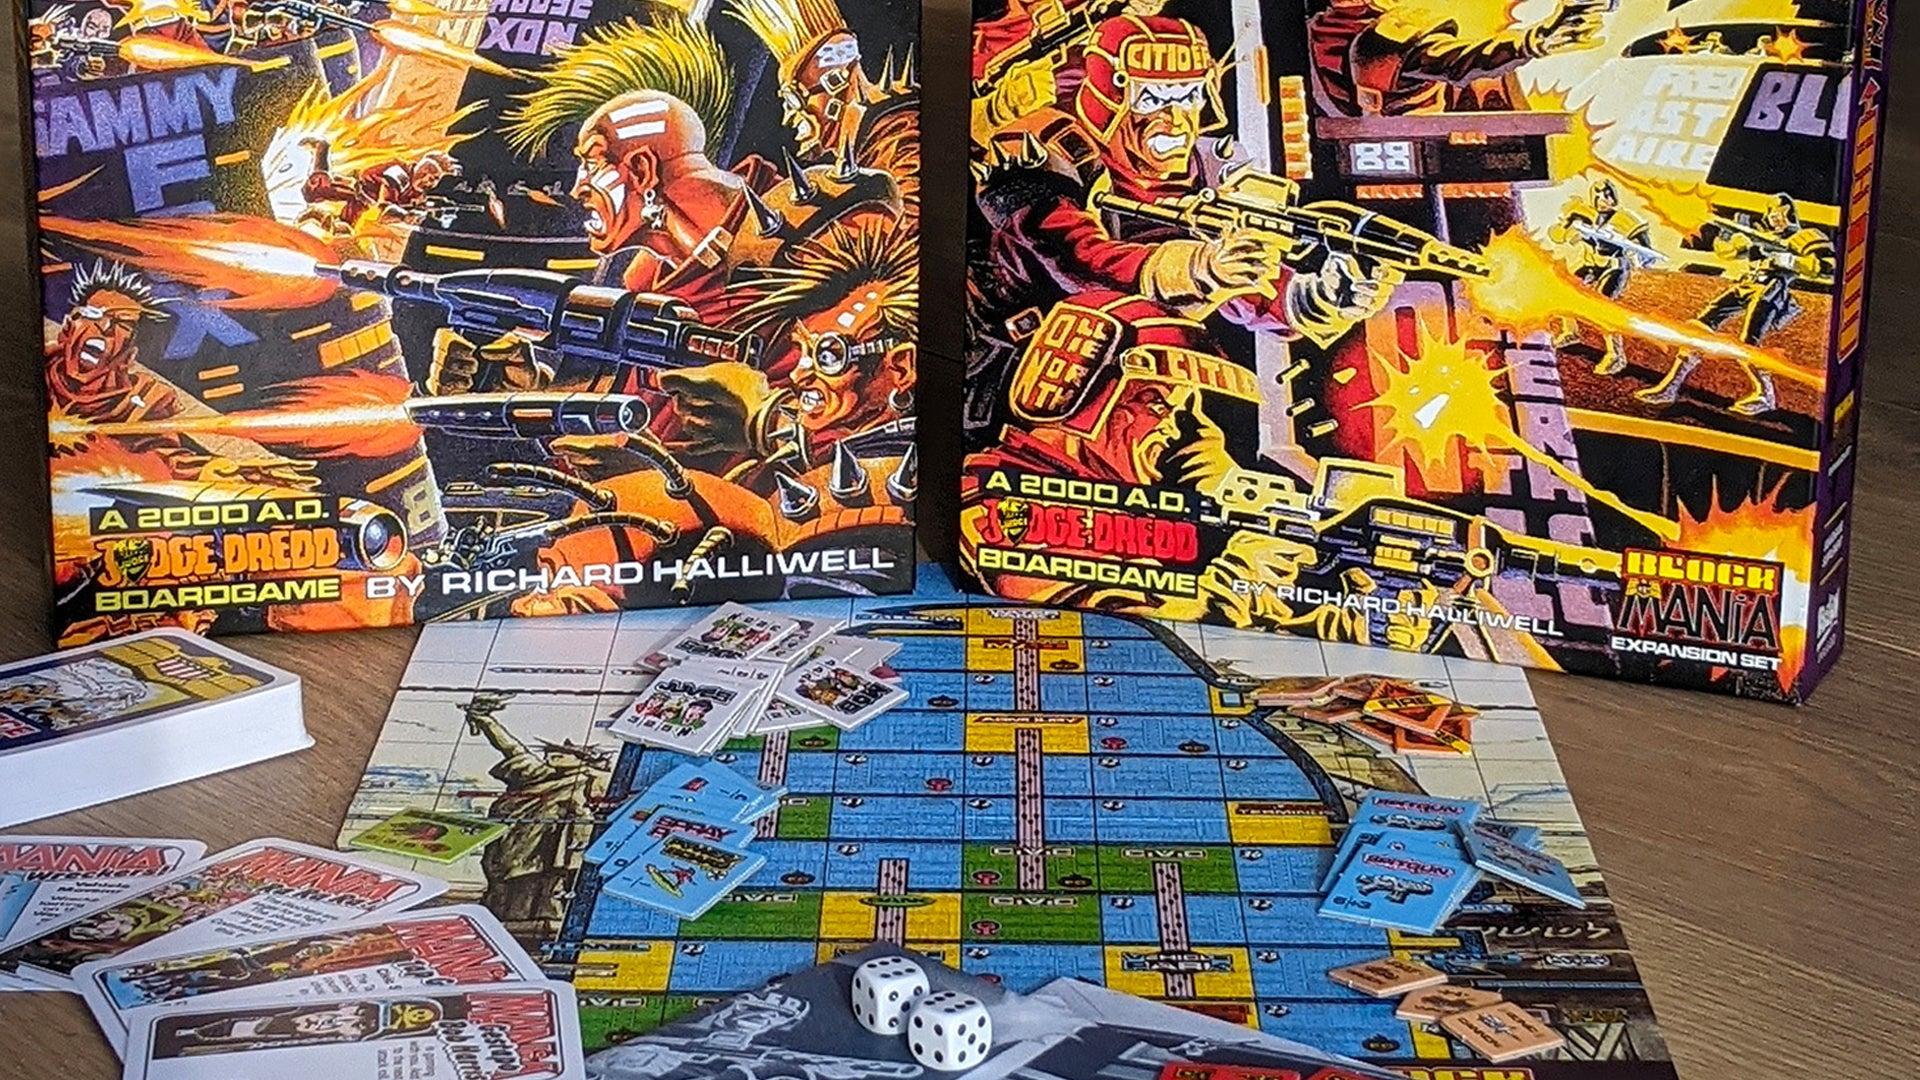 block-mania-board-game-components-box.jpg